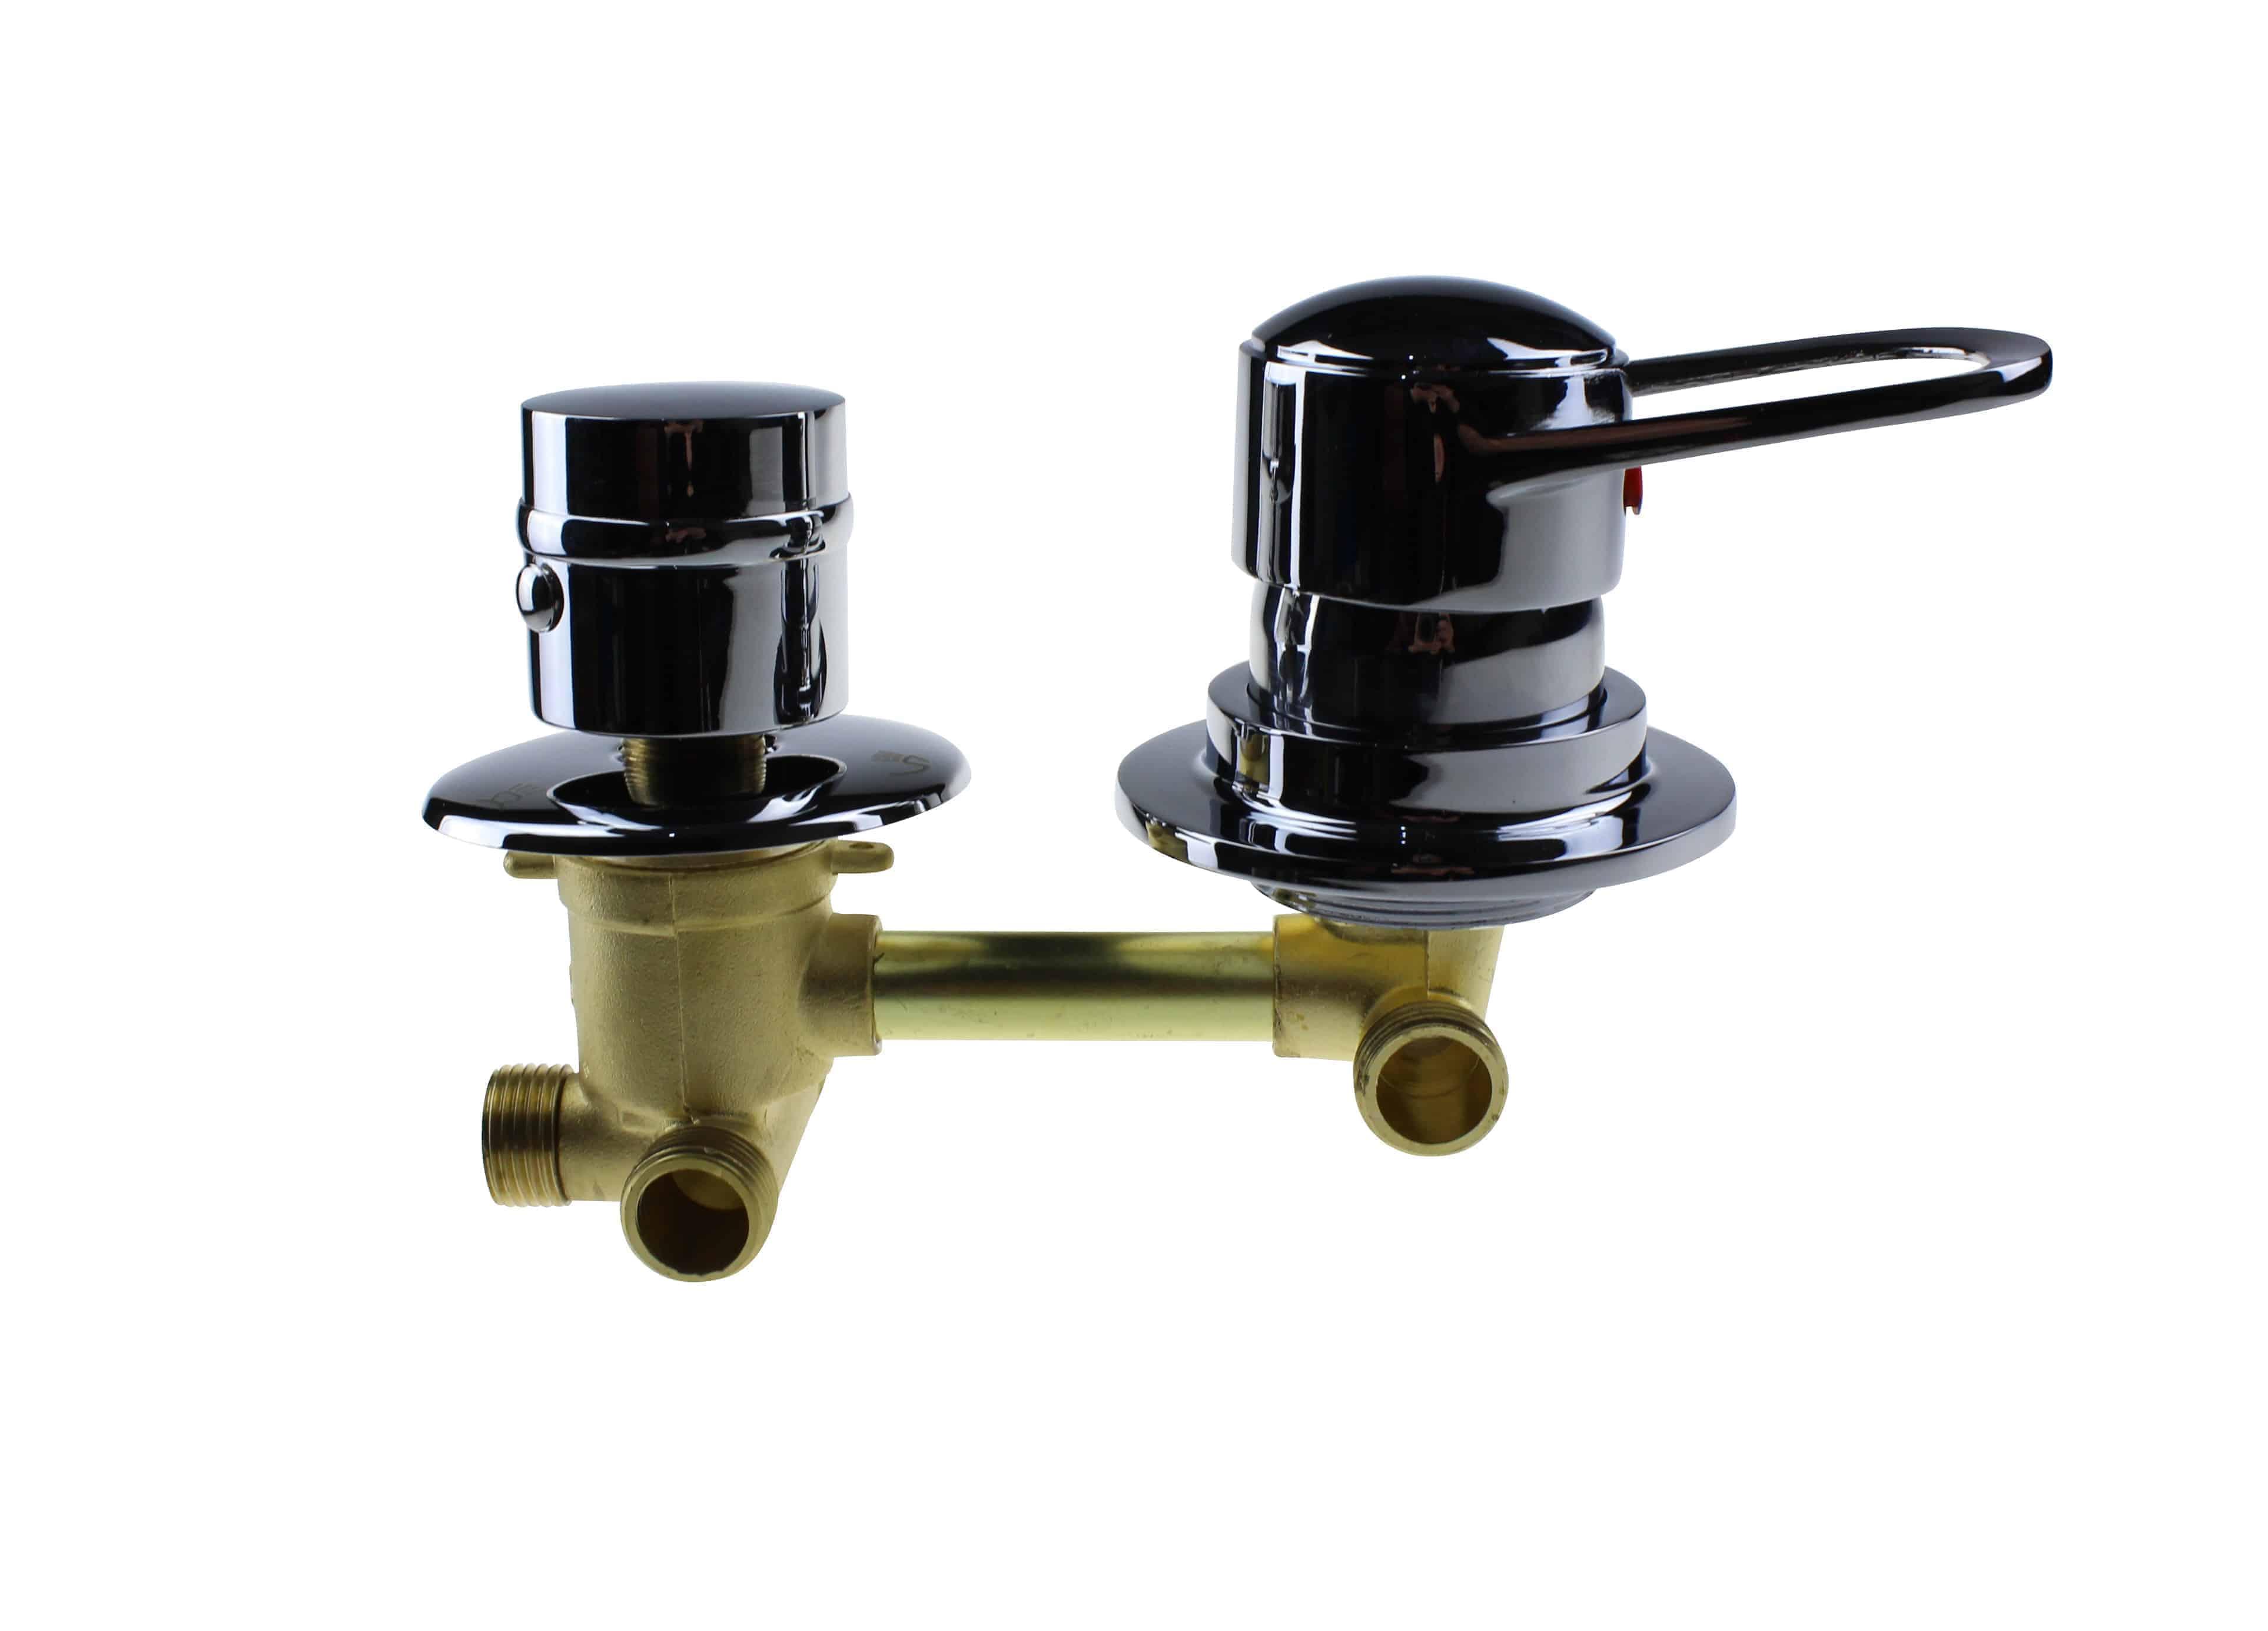 2 dial shower mixer valve threaded 100mm centres. Black Bedroom Furniture Sets. Home Design Ideas